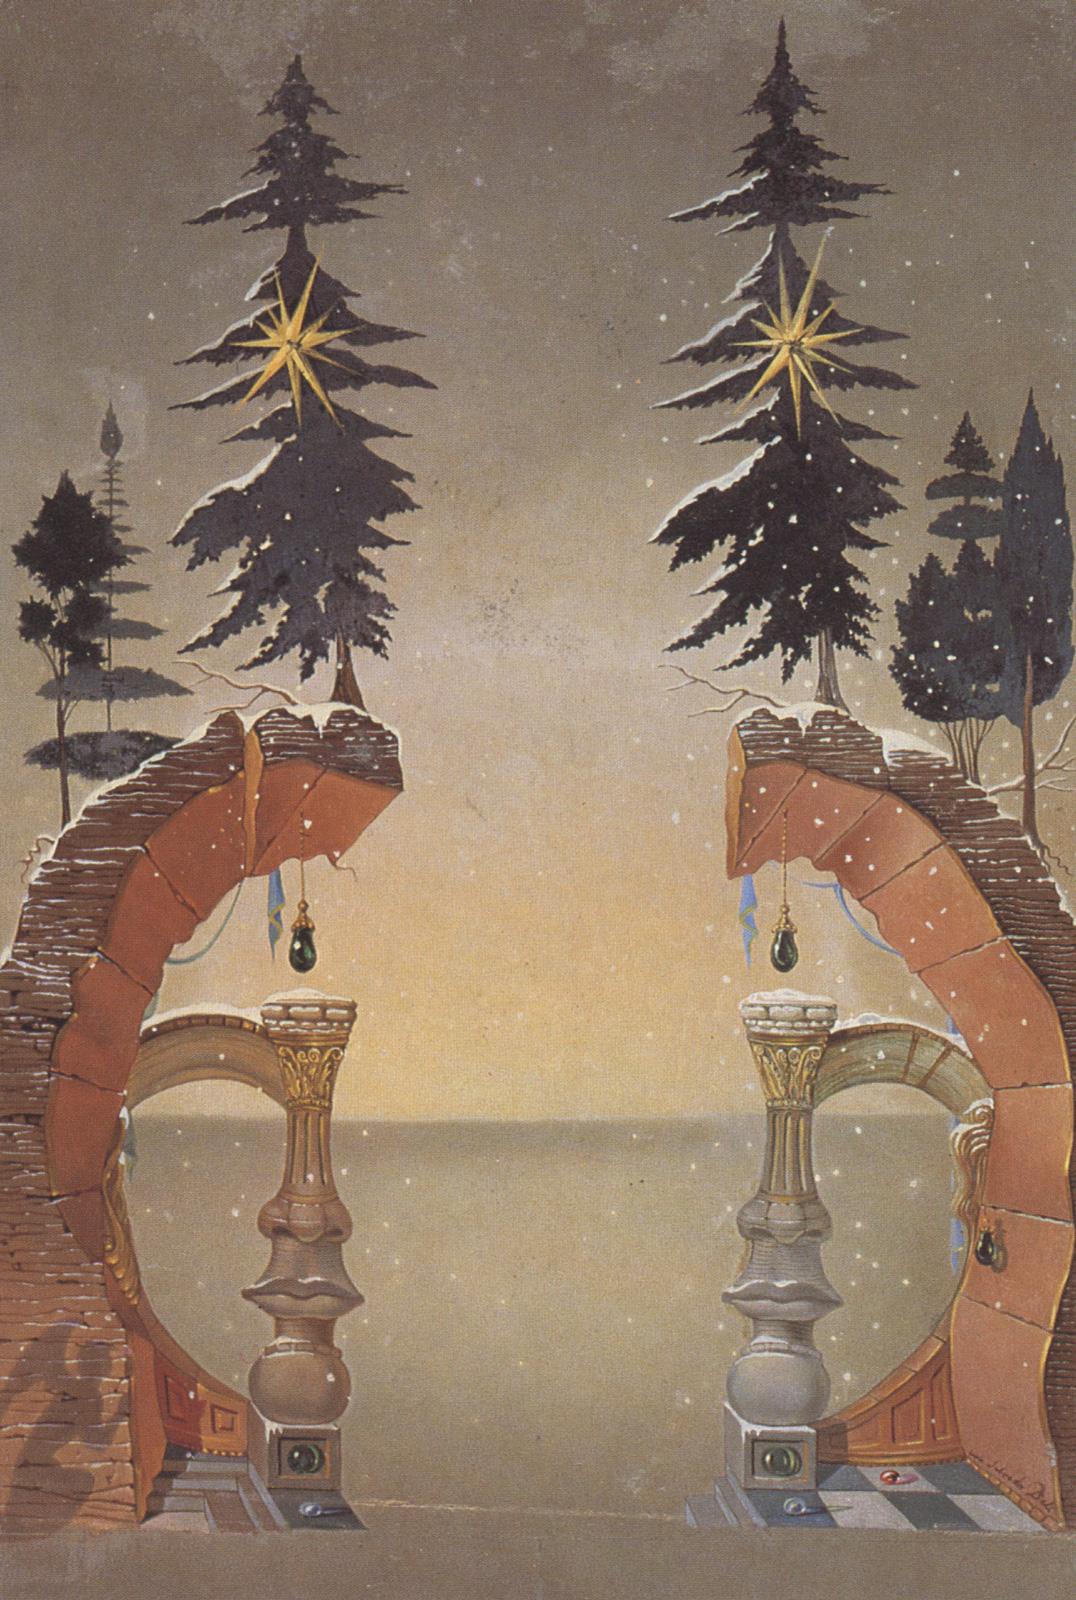 http://uploads7.wikipaintings.org/images/salvador-dali/christmas-noel.jpg